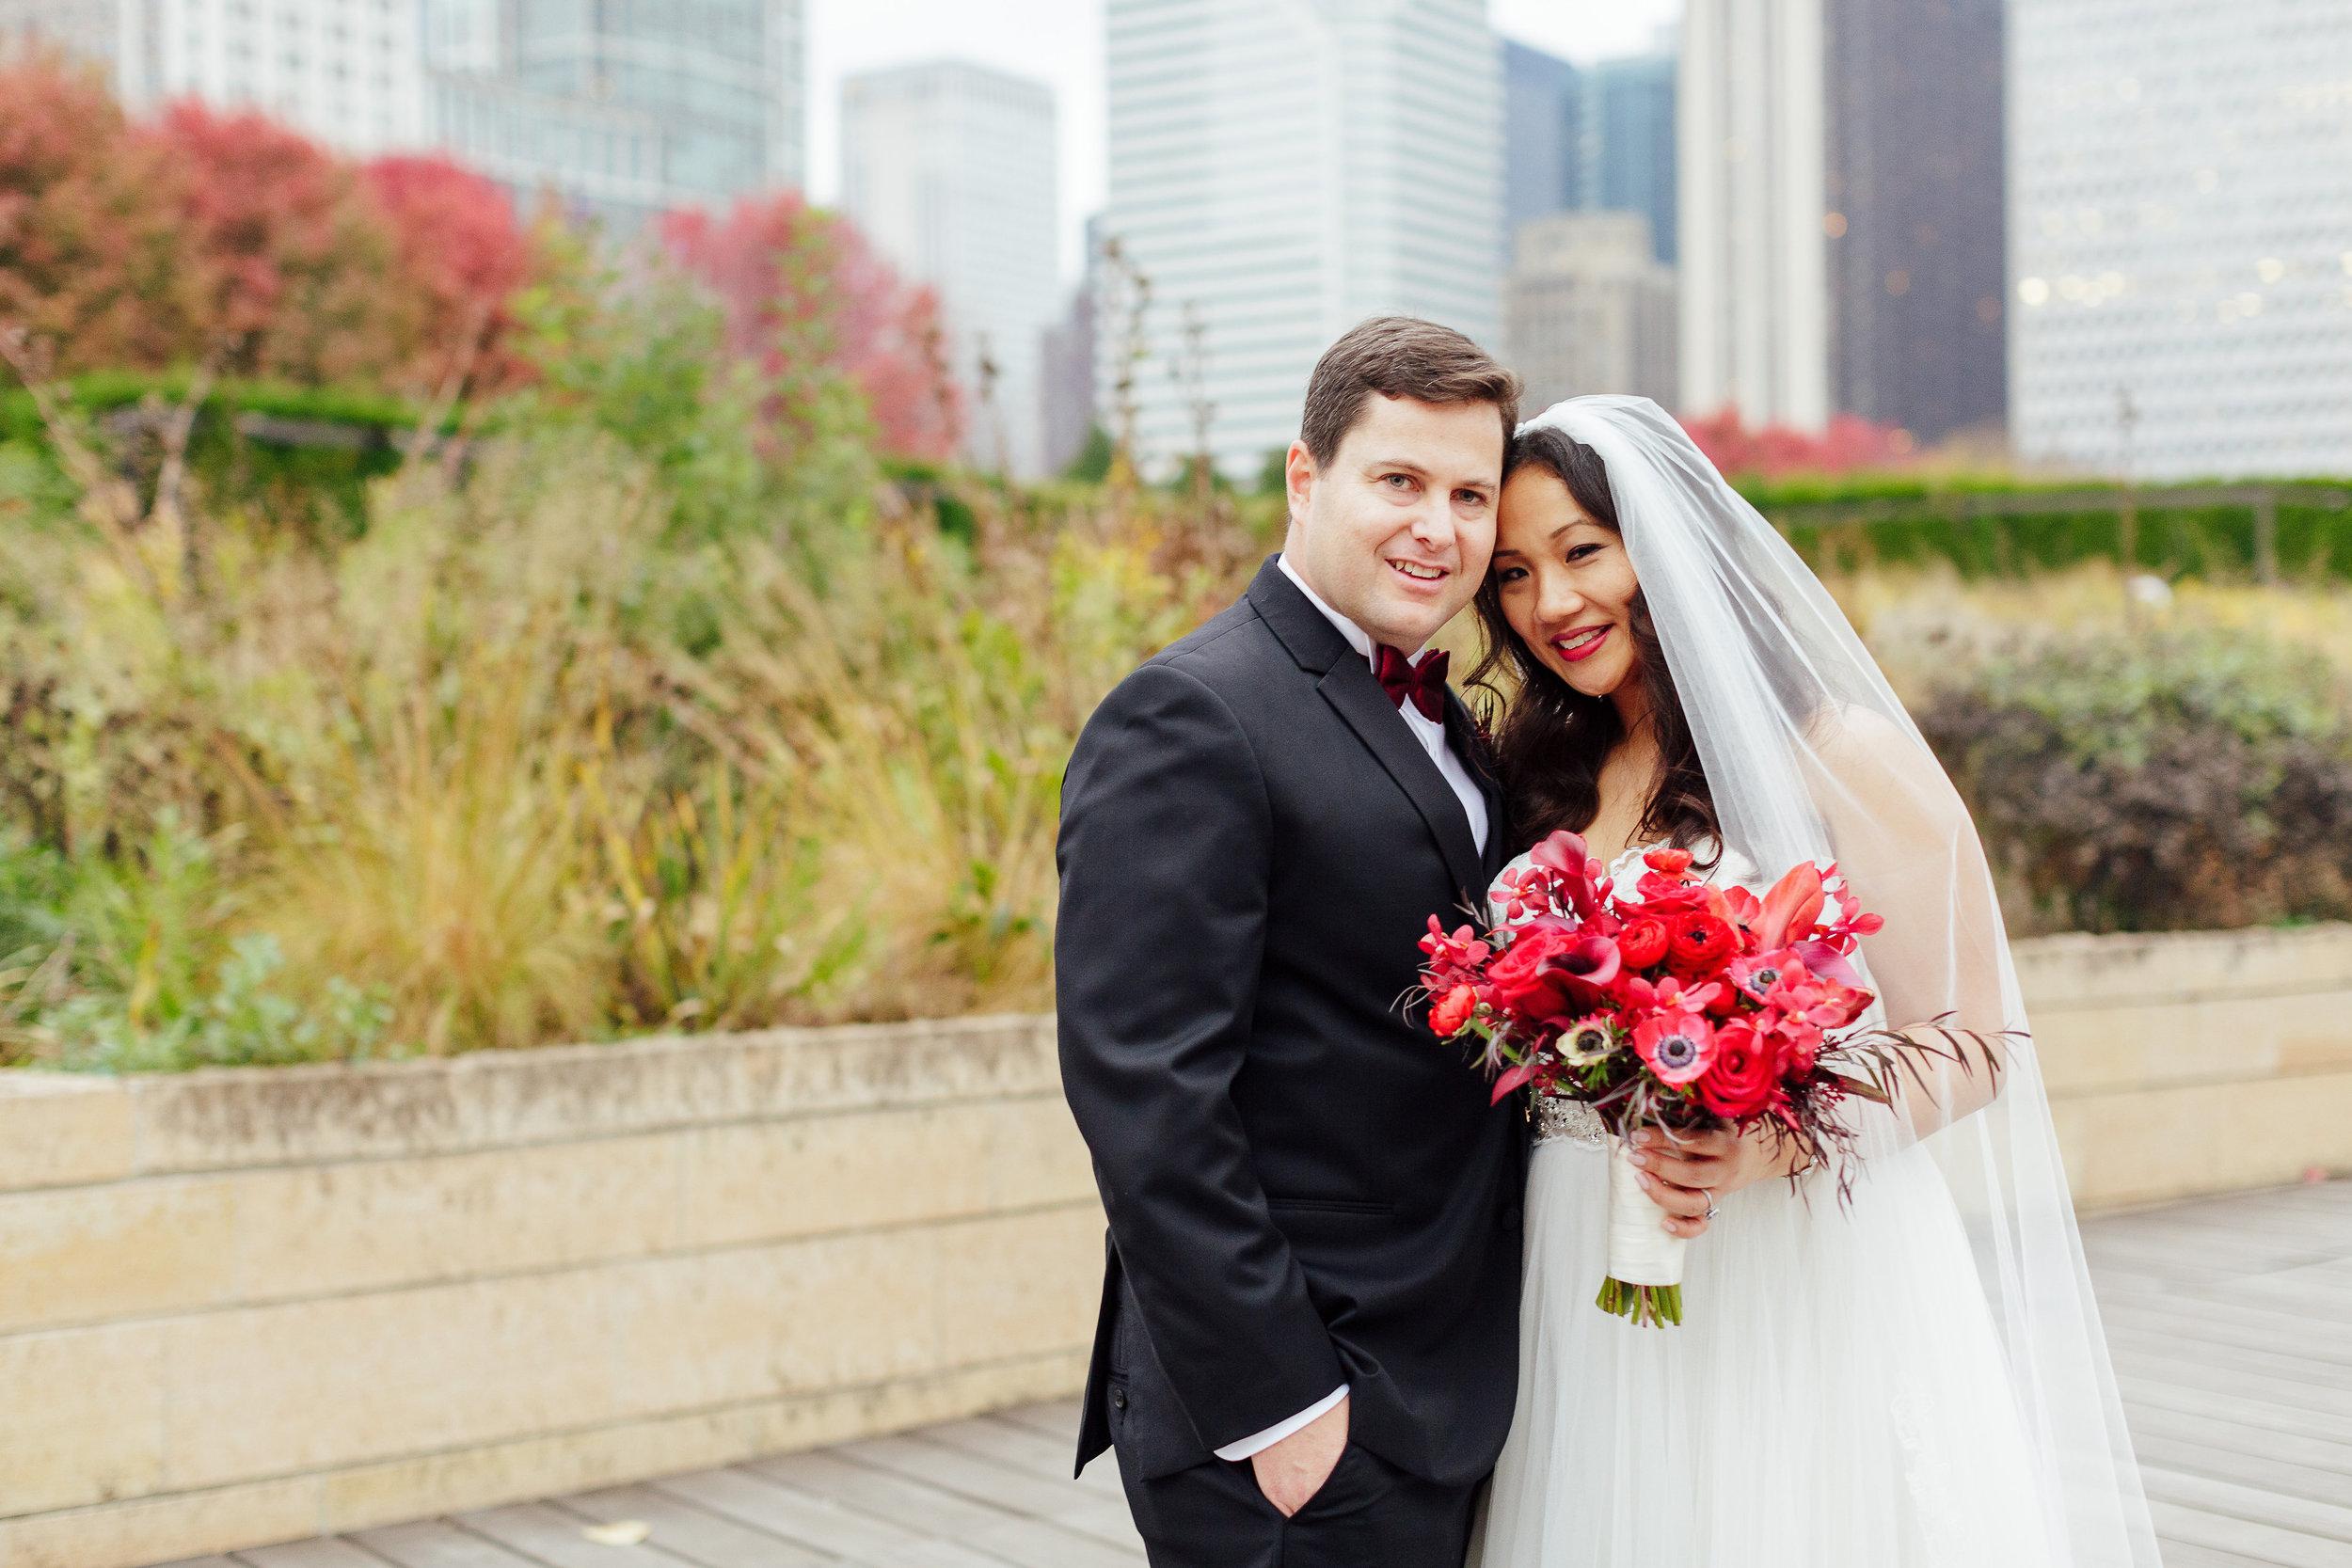 Clover Events | W City Center Wedding | Sarah Postma Photography